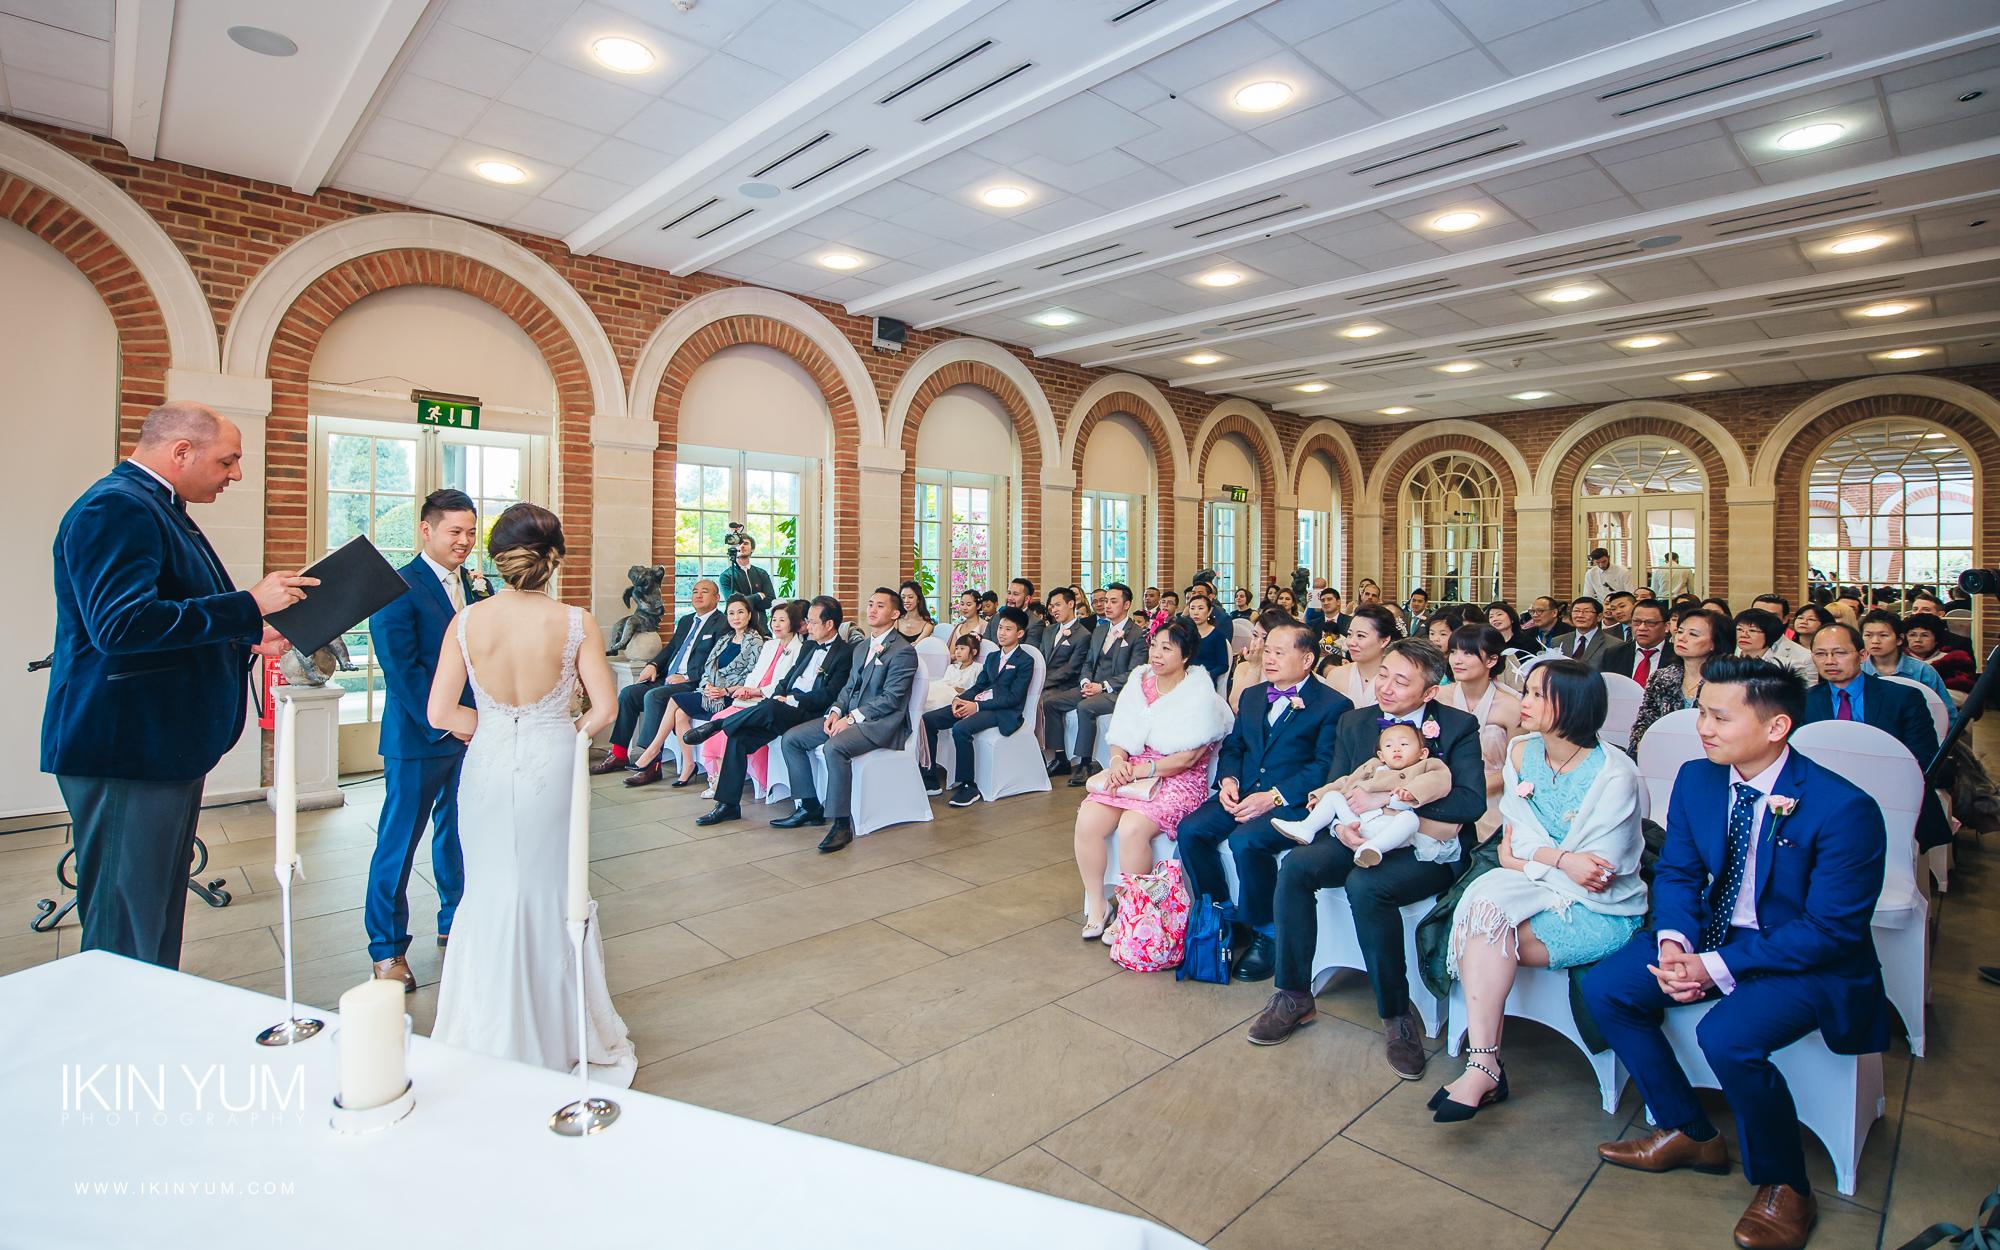 Great Foster Wedding - Ikin Yum Photography-107.jpg